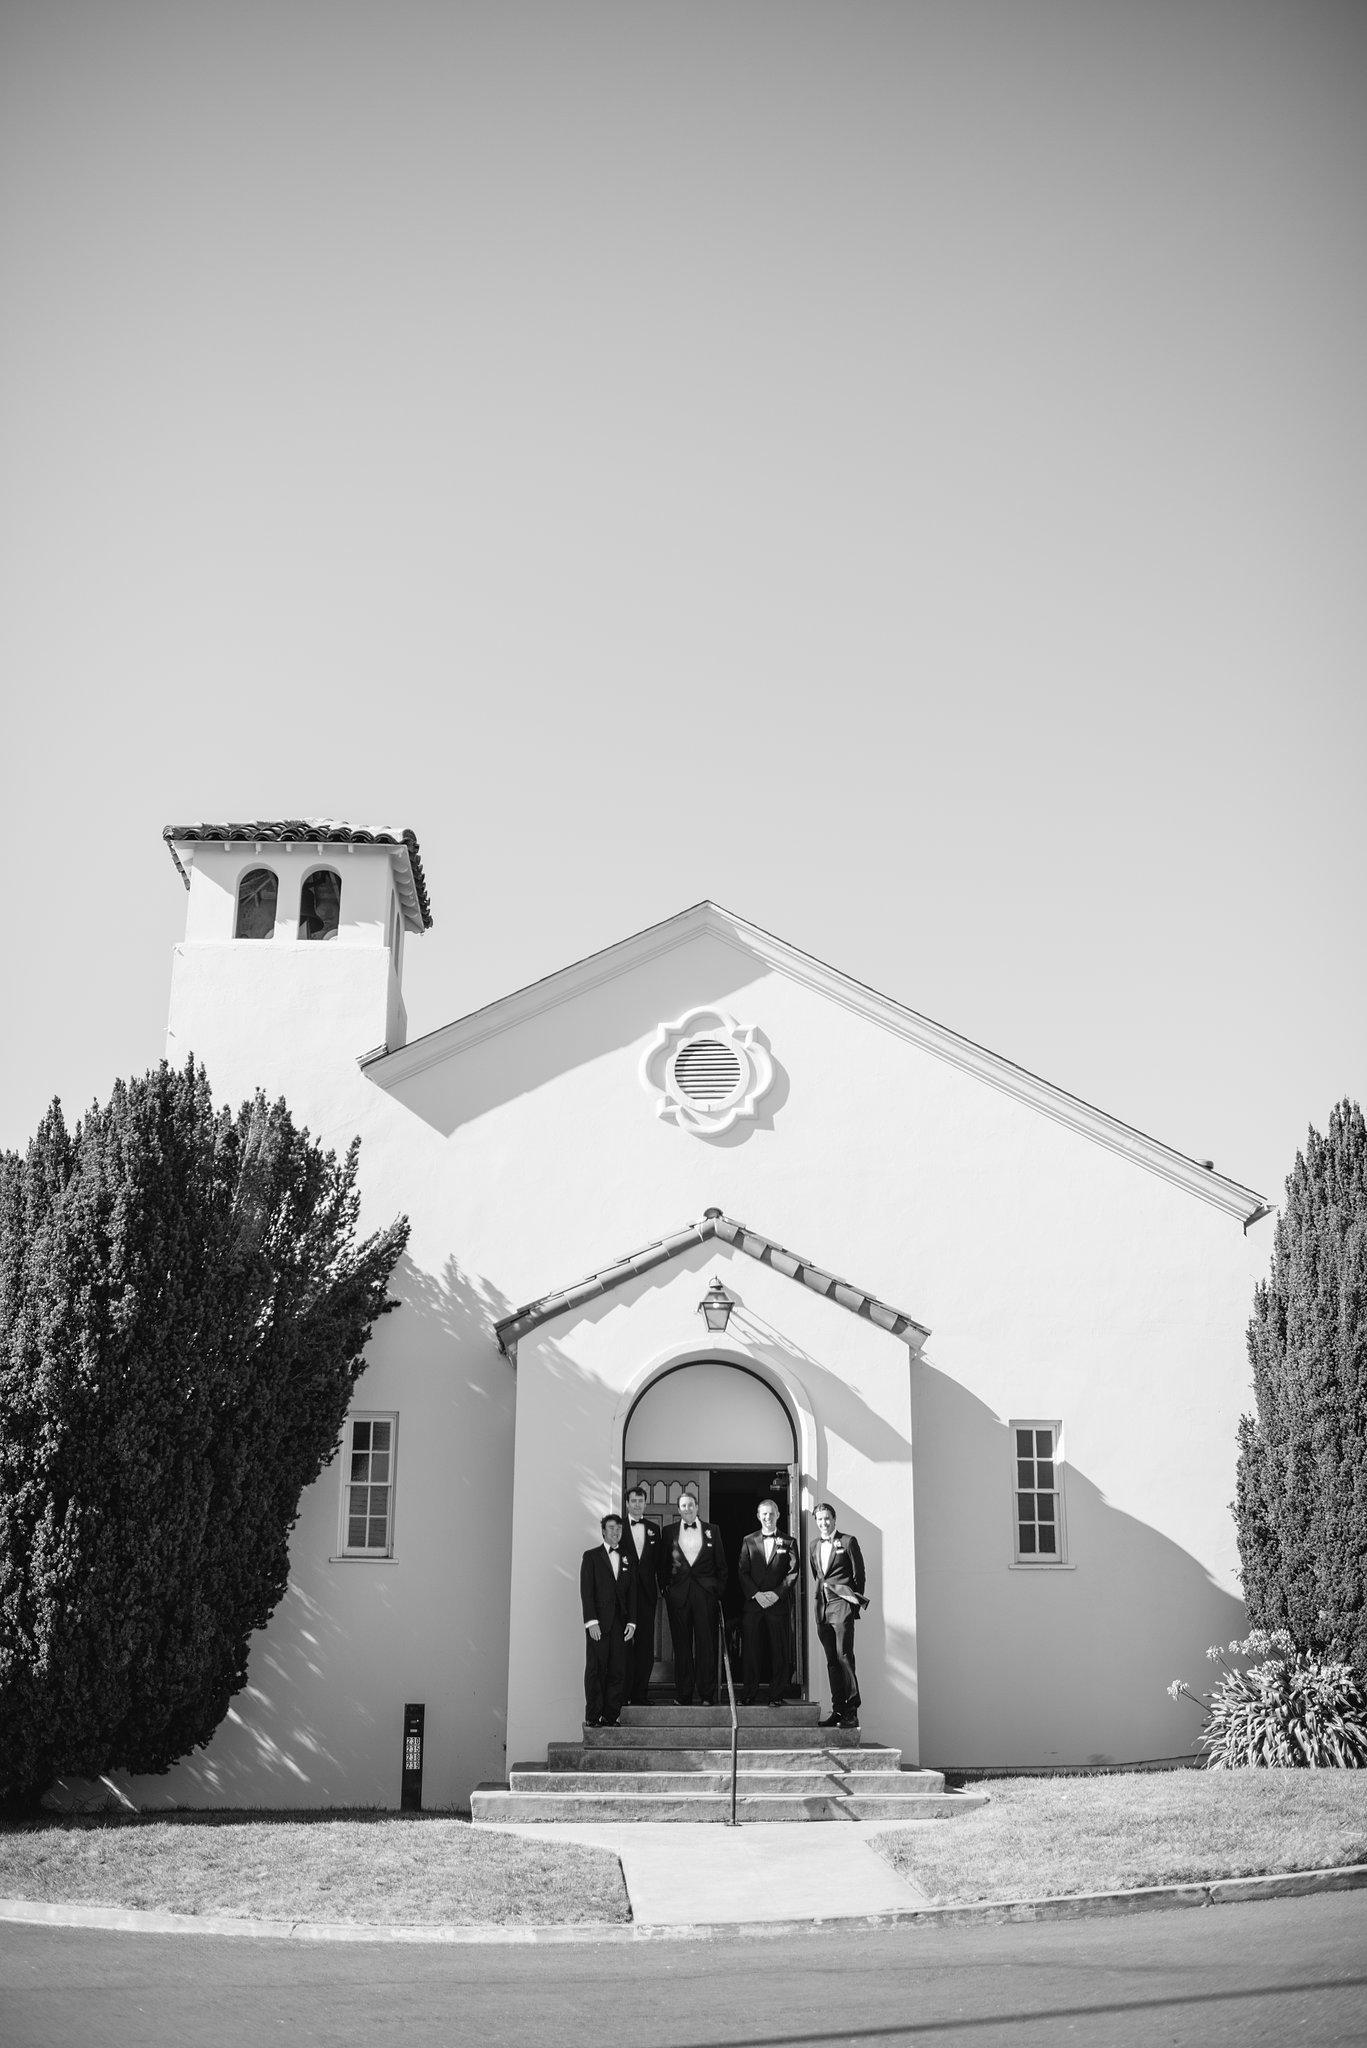 Photos by Delbarr Moradi Photography